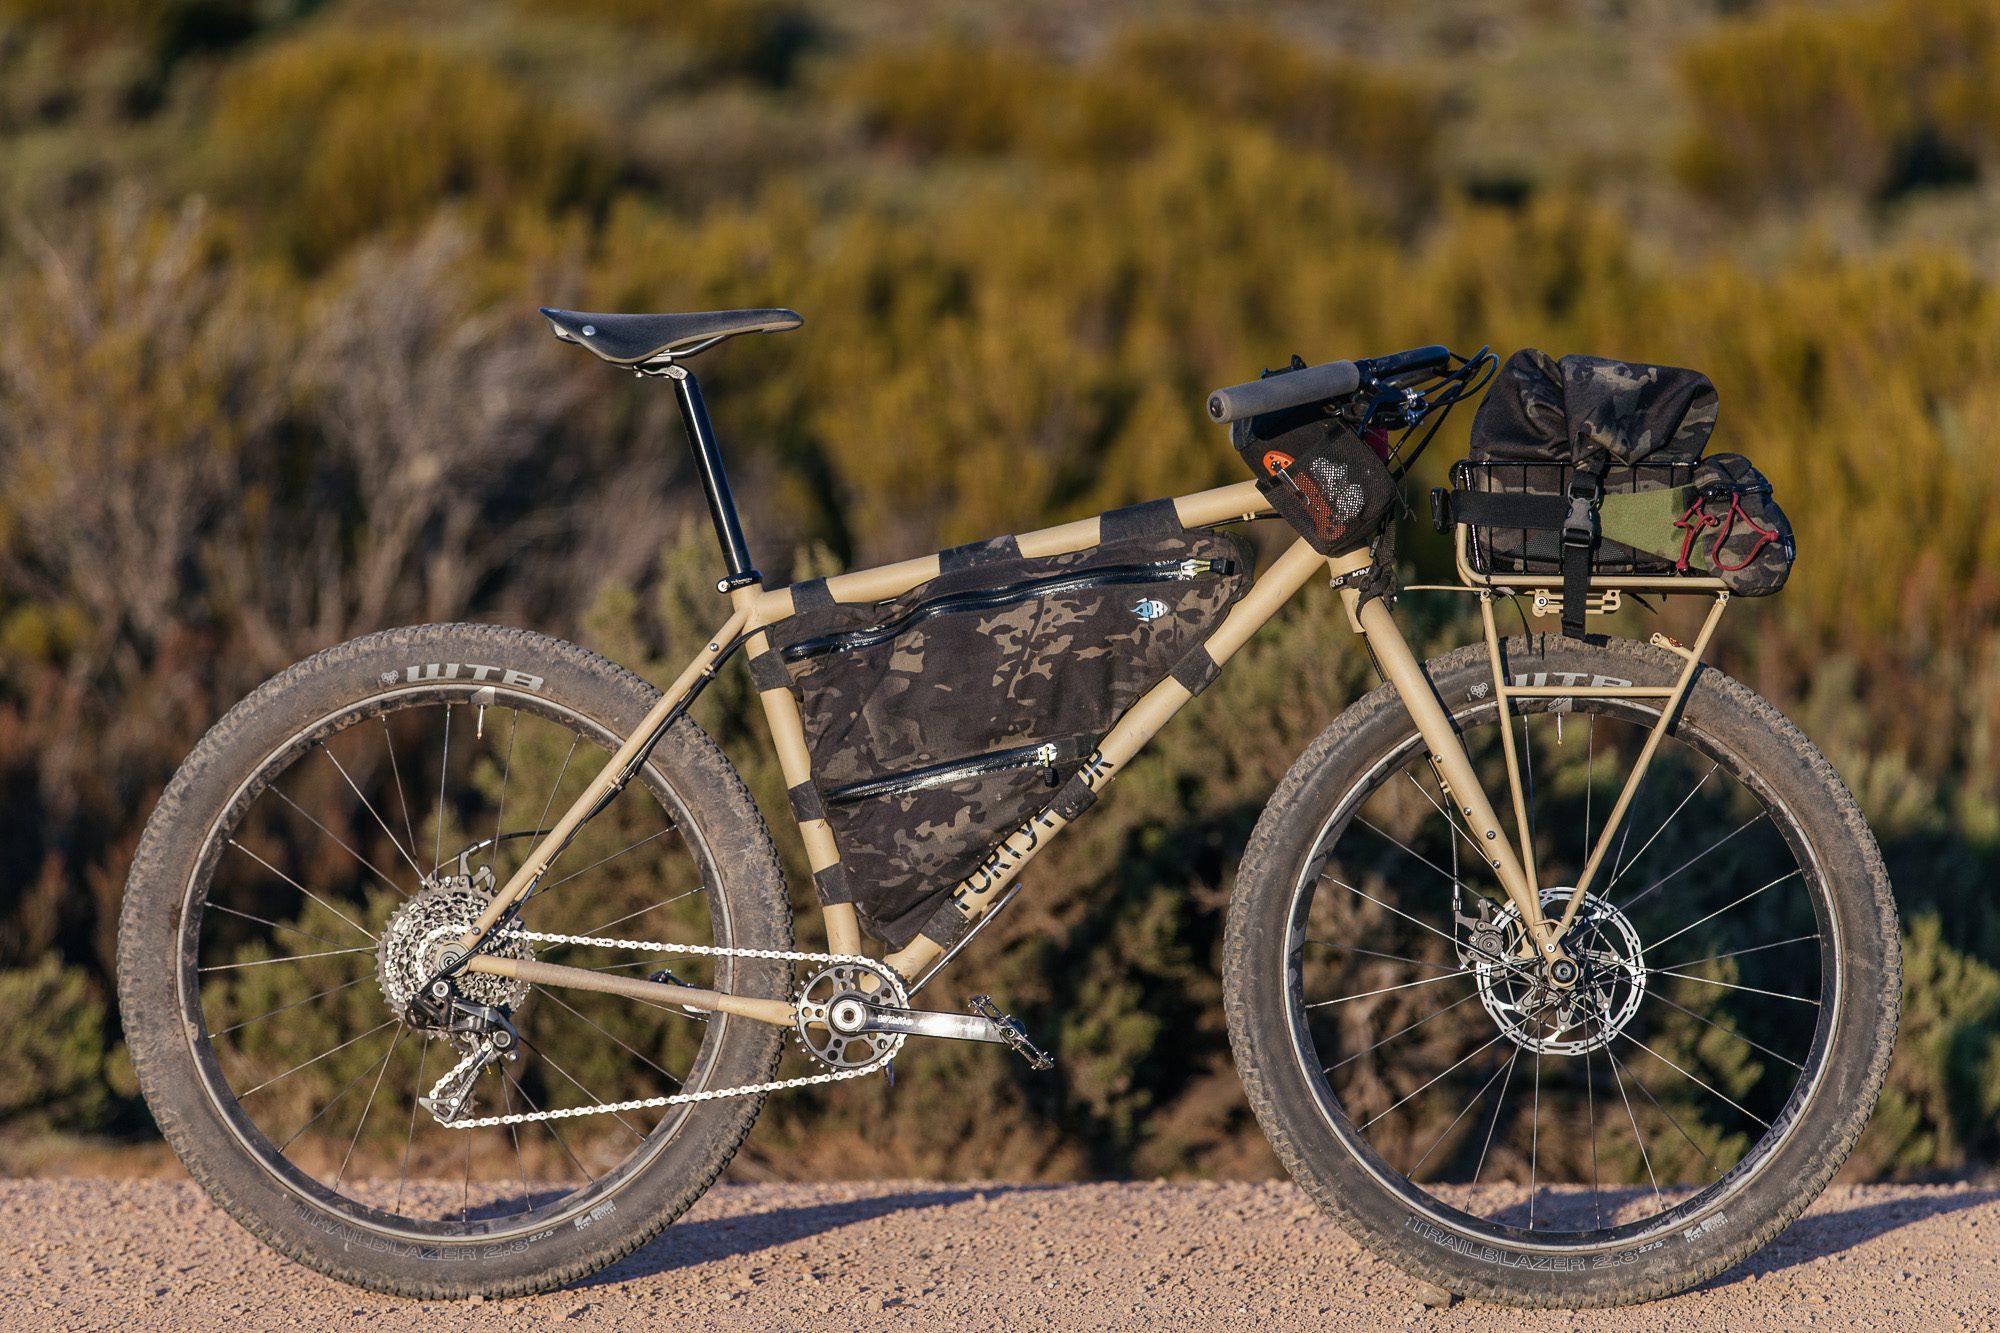 09-My-Bush-Blasted-44-Bikes-Rigid-MTB-Tourer-35